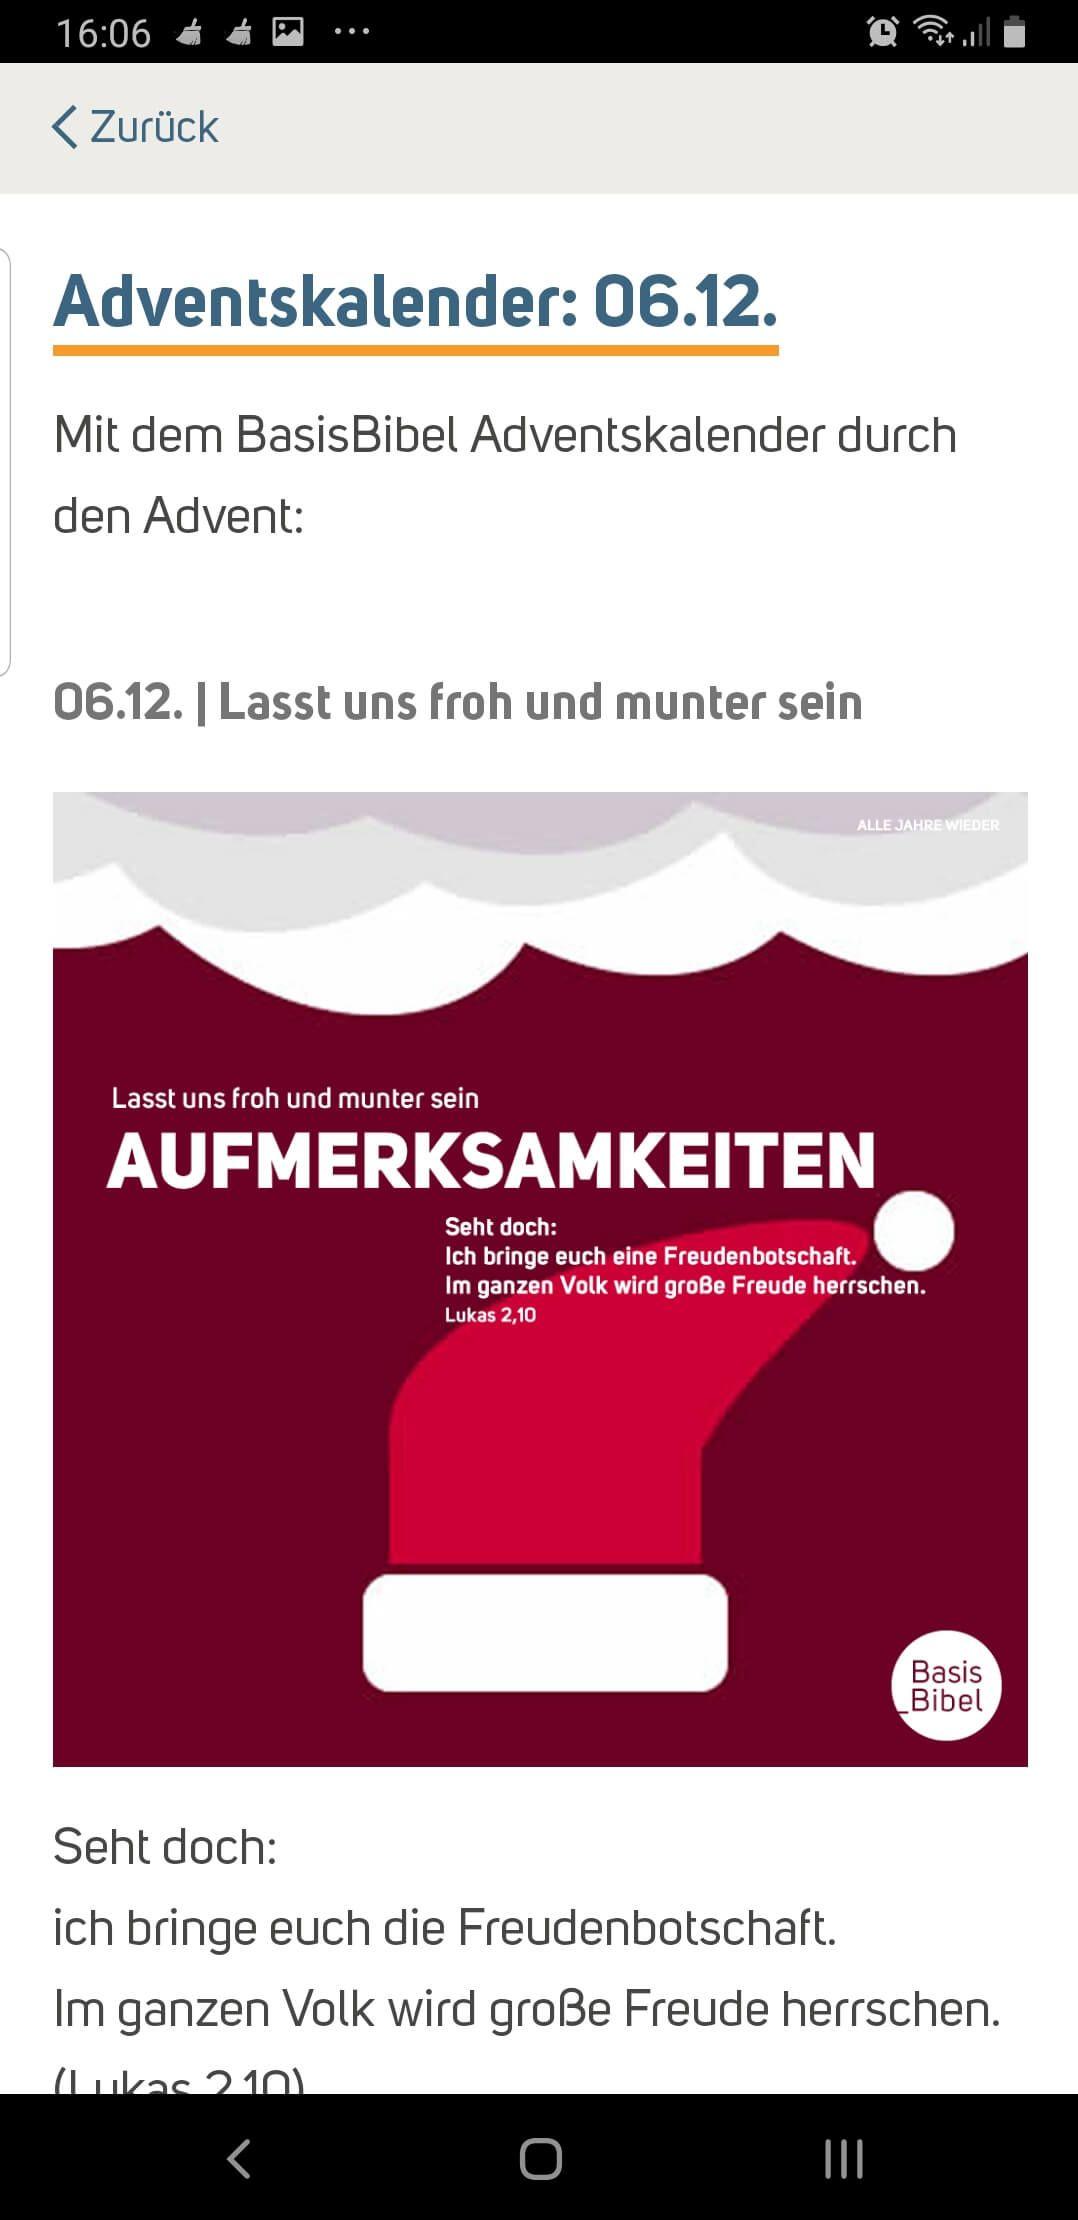 Ev. Landeskirche in Württemberg: 06.12.2019 Bibel-App auf